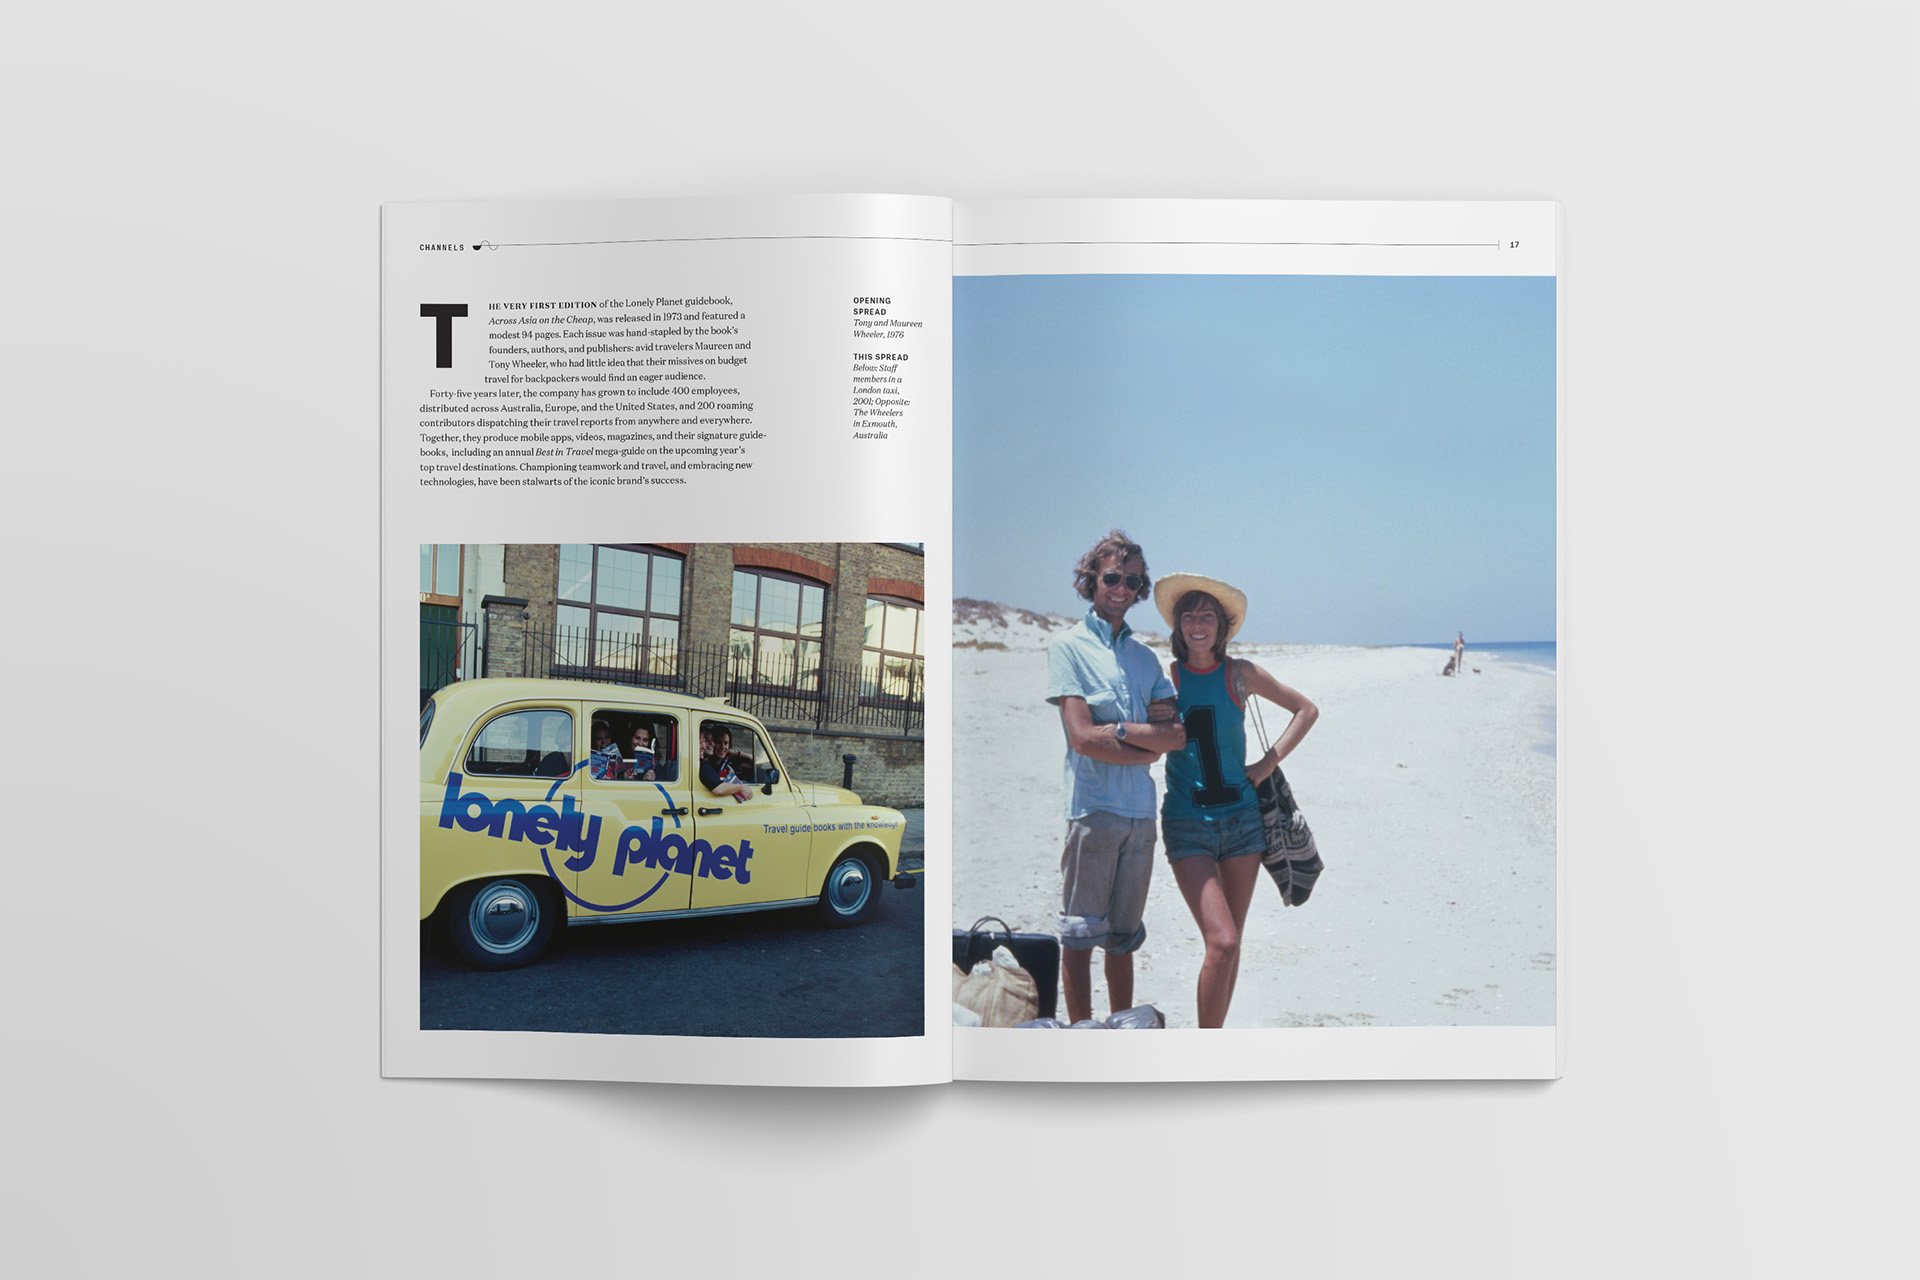 Slack Channels magazine Lonely Planet photo essay 02